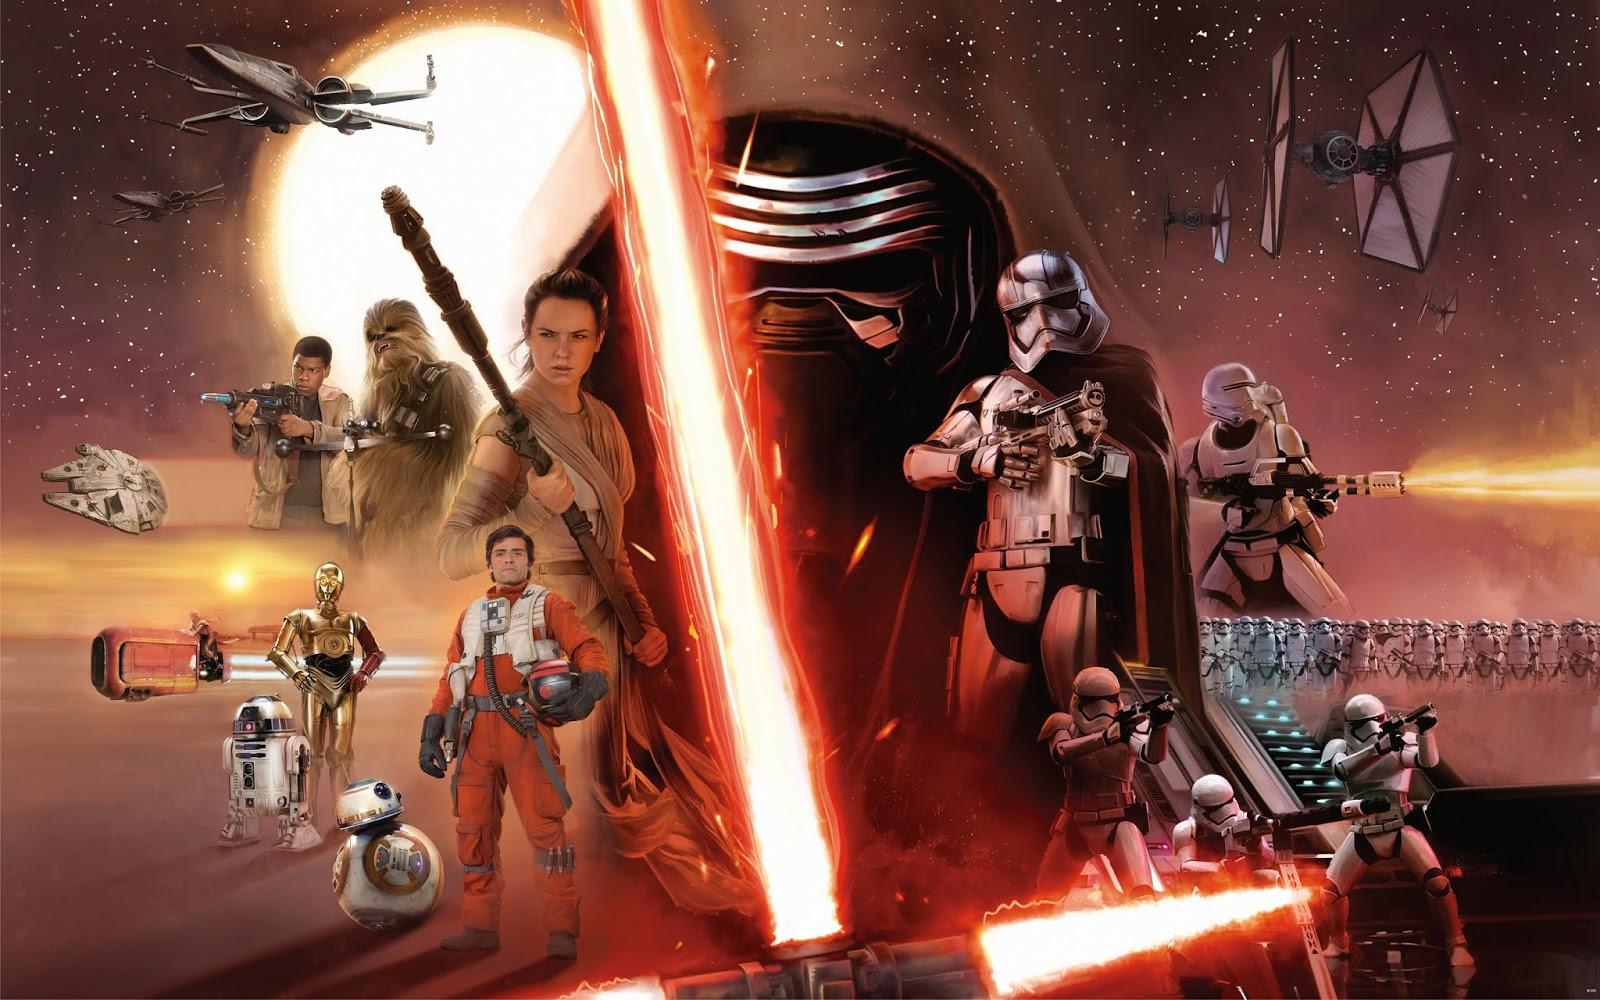 The Force awakens wallpaper hd download